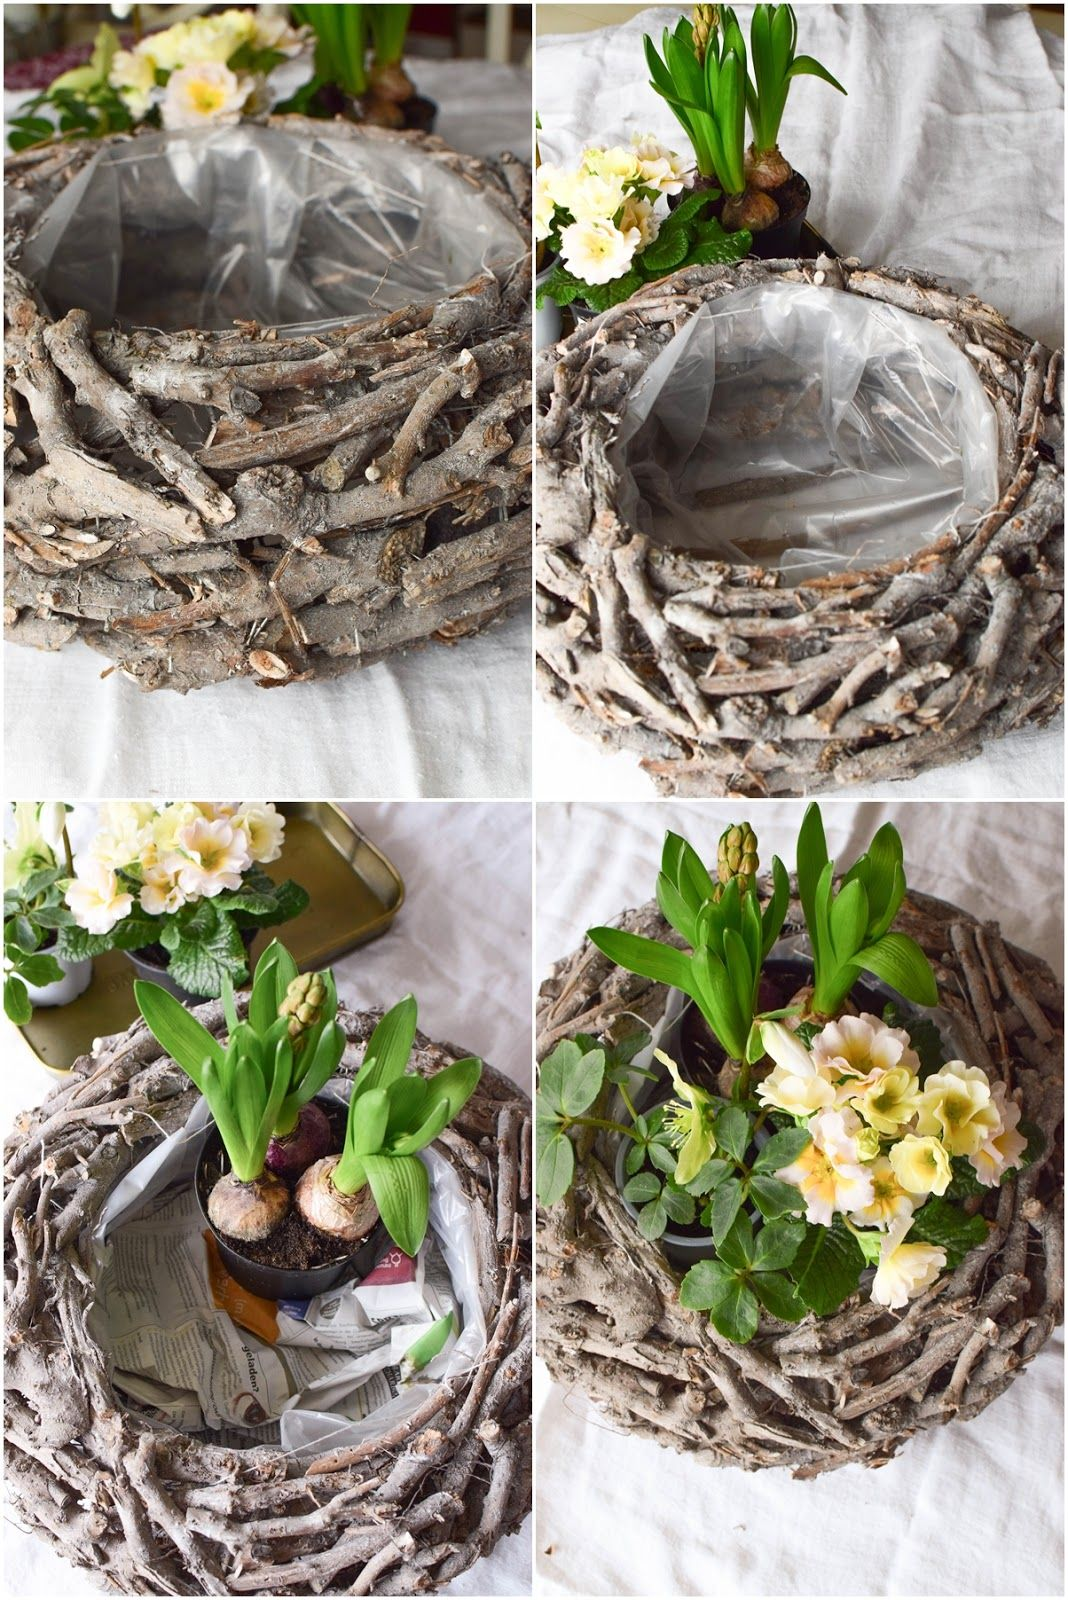 DIY Frühlingskorb: natürlich dekoriert